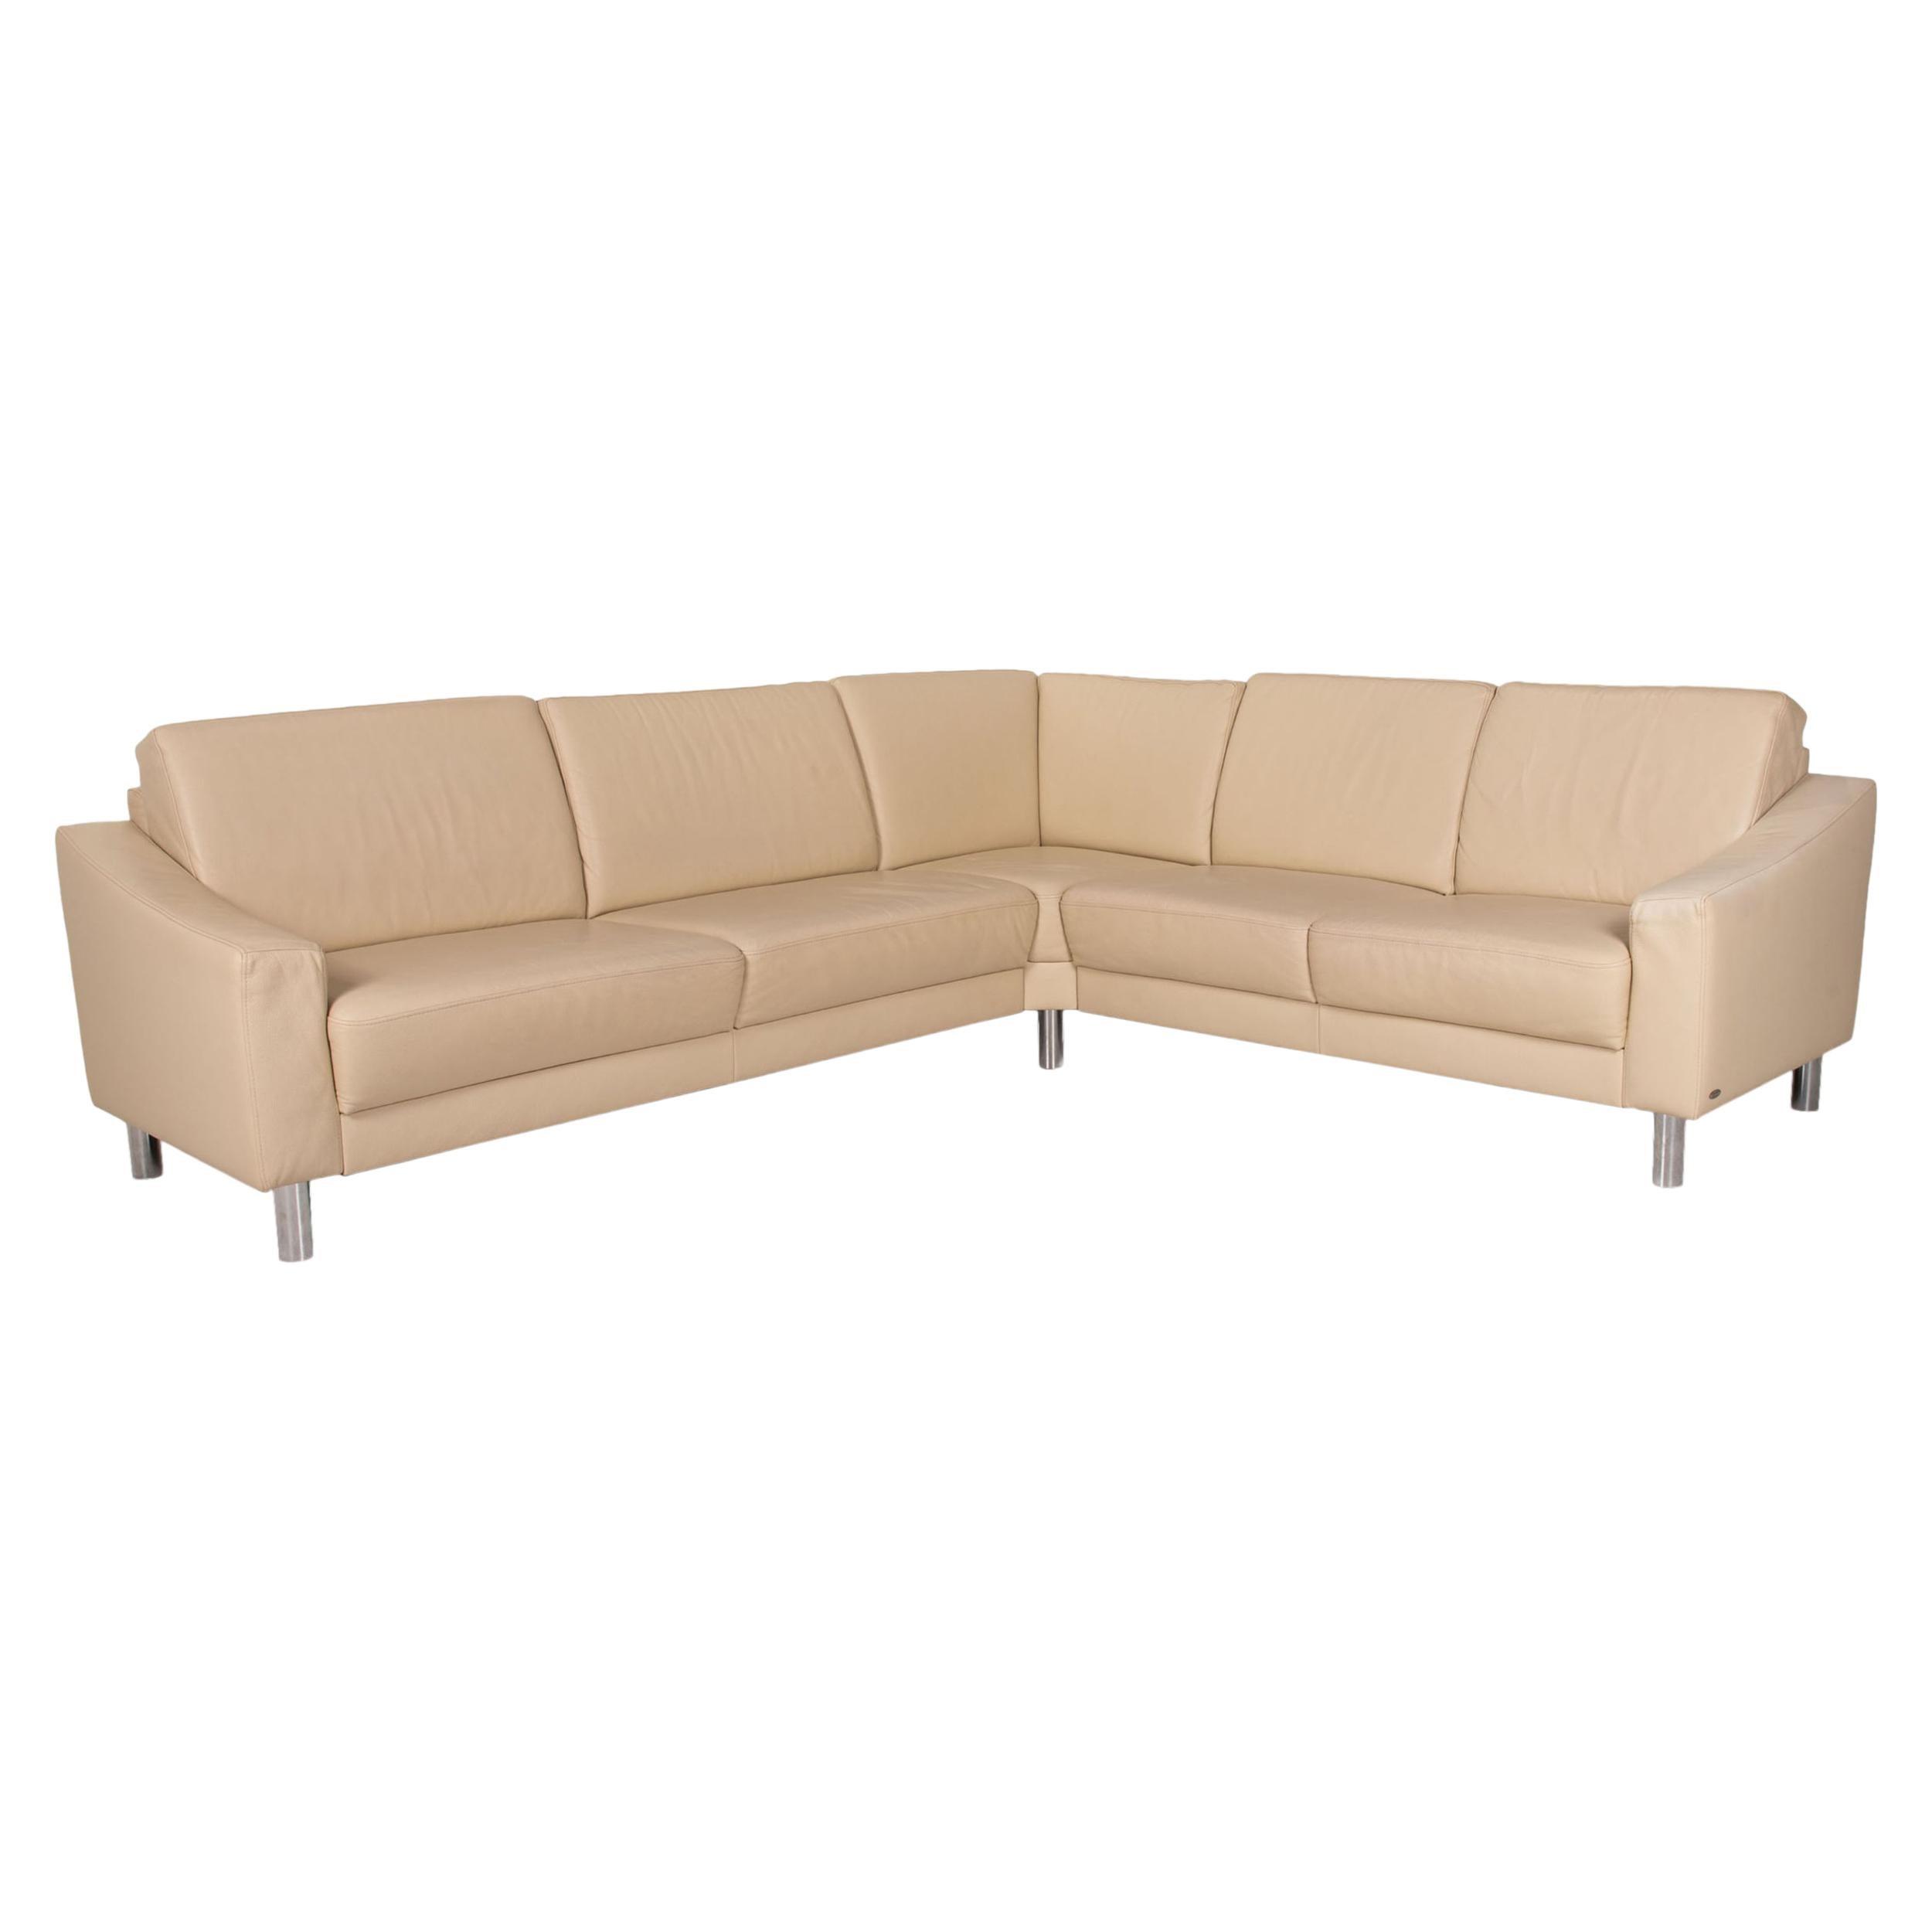 Gepade Leather Sofa Cream Corner Sofa Couch